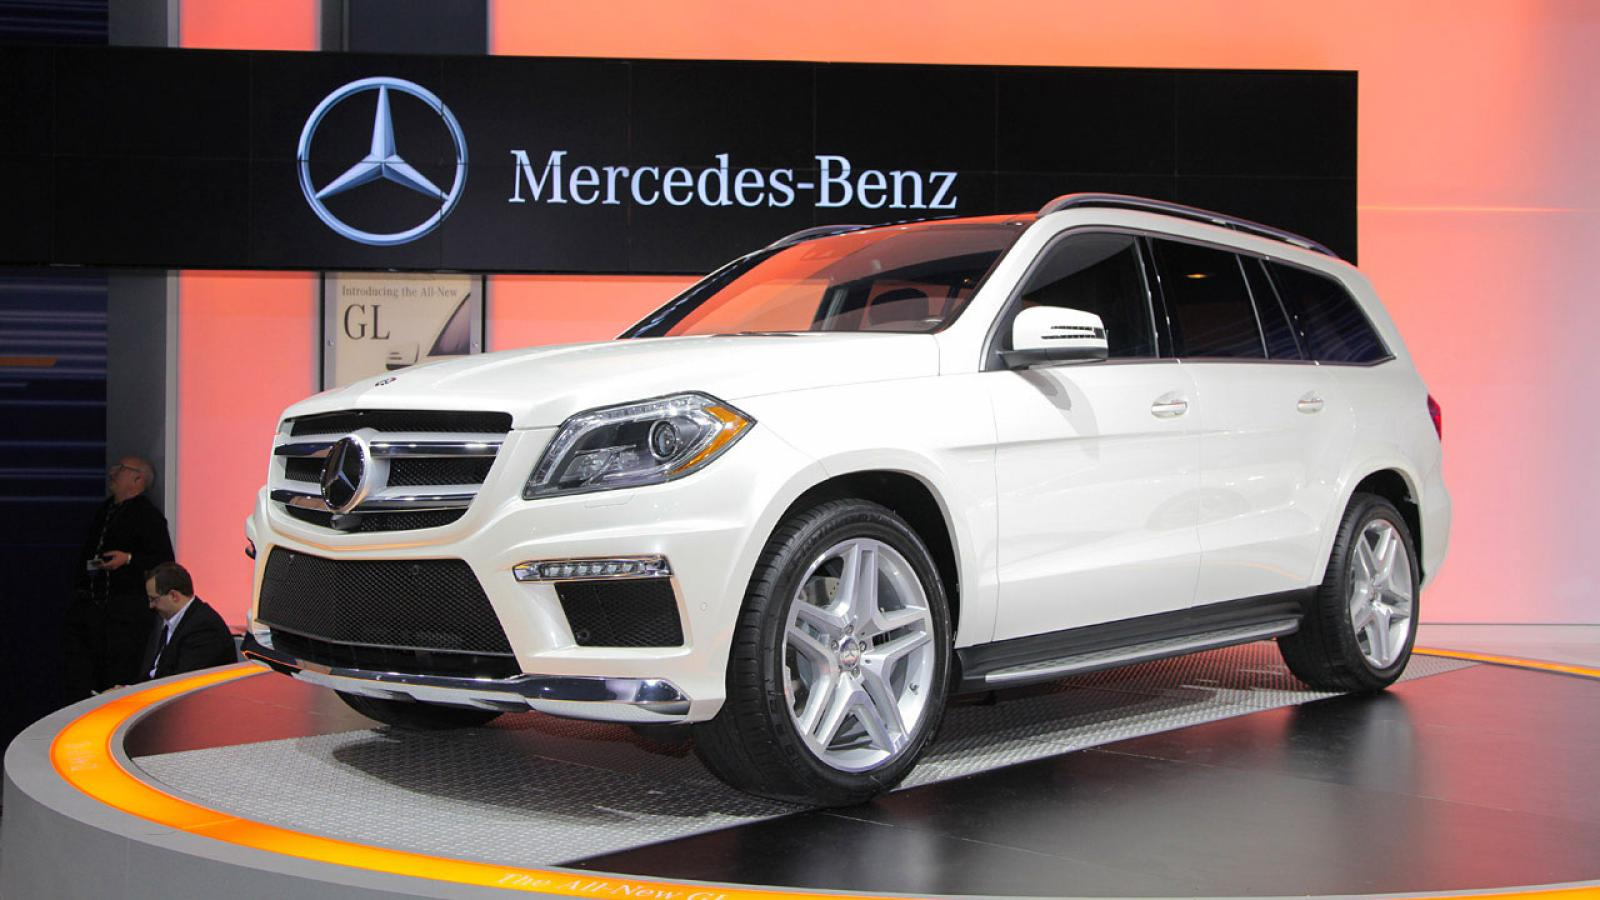 2014 mercedes benz gl class information and photos for Mercedes benz gls 2014